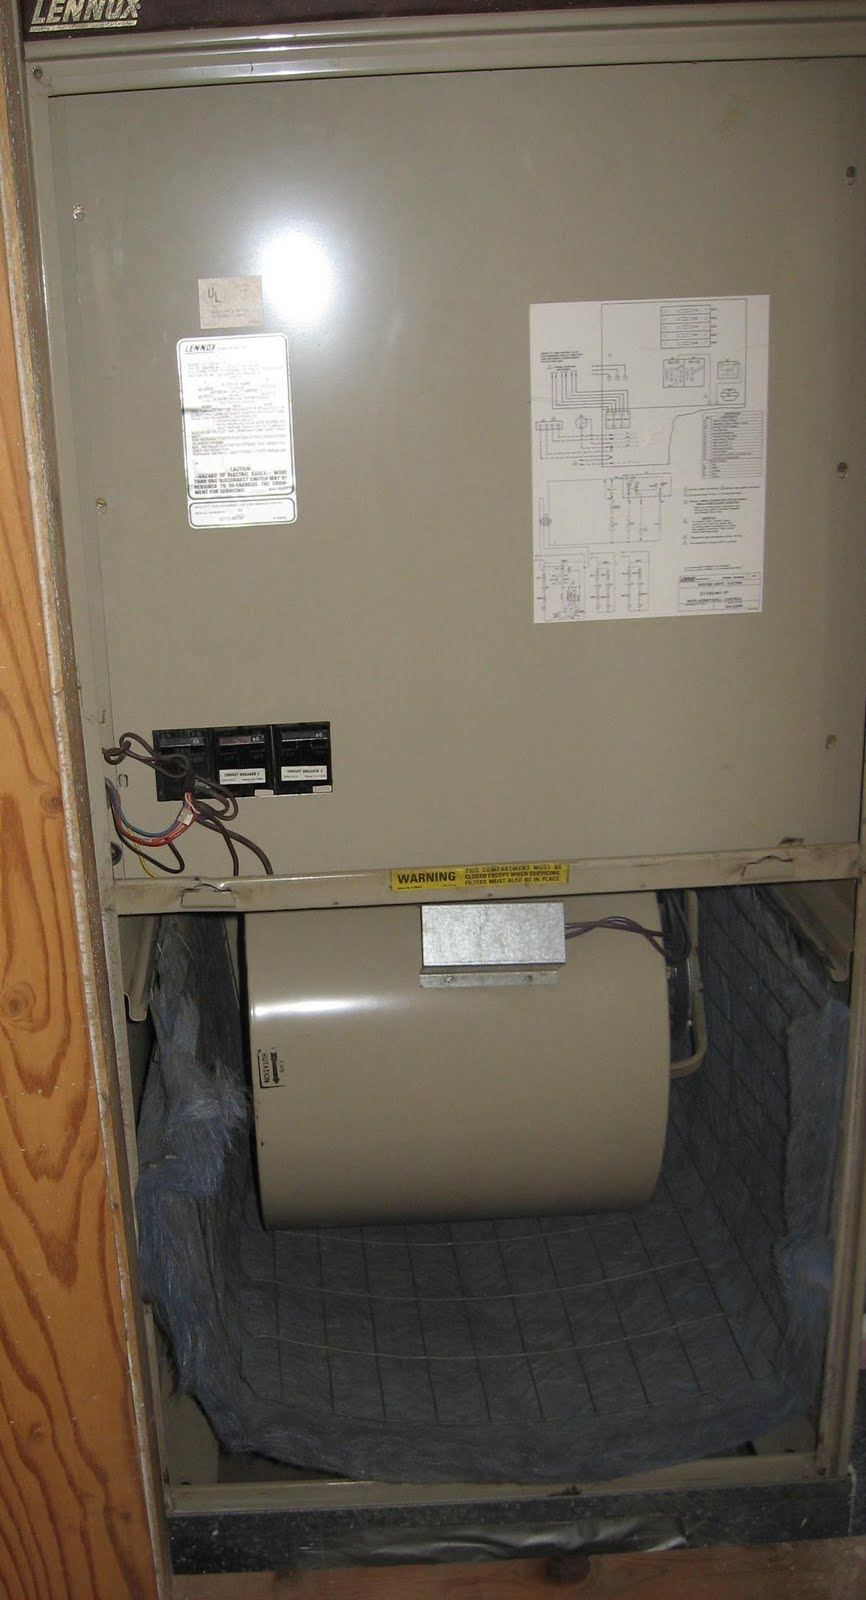 bryant gas furnace wiring diagram on electric furnace blower wiring [ 866 x 1600 Pixel ]